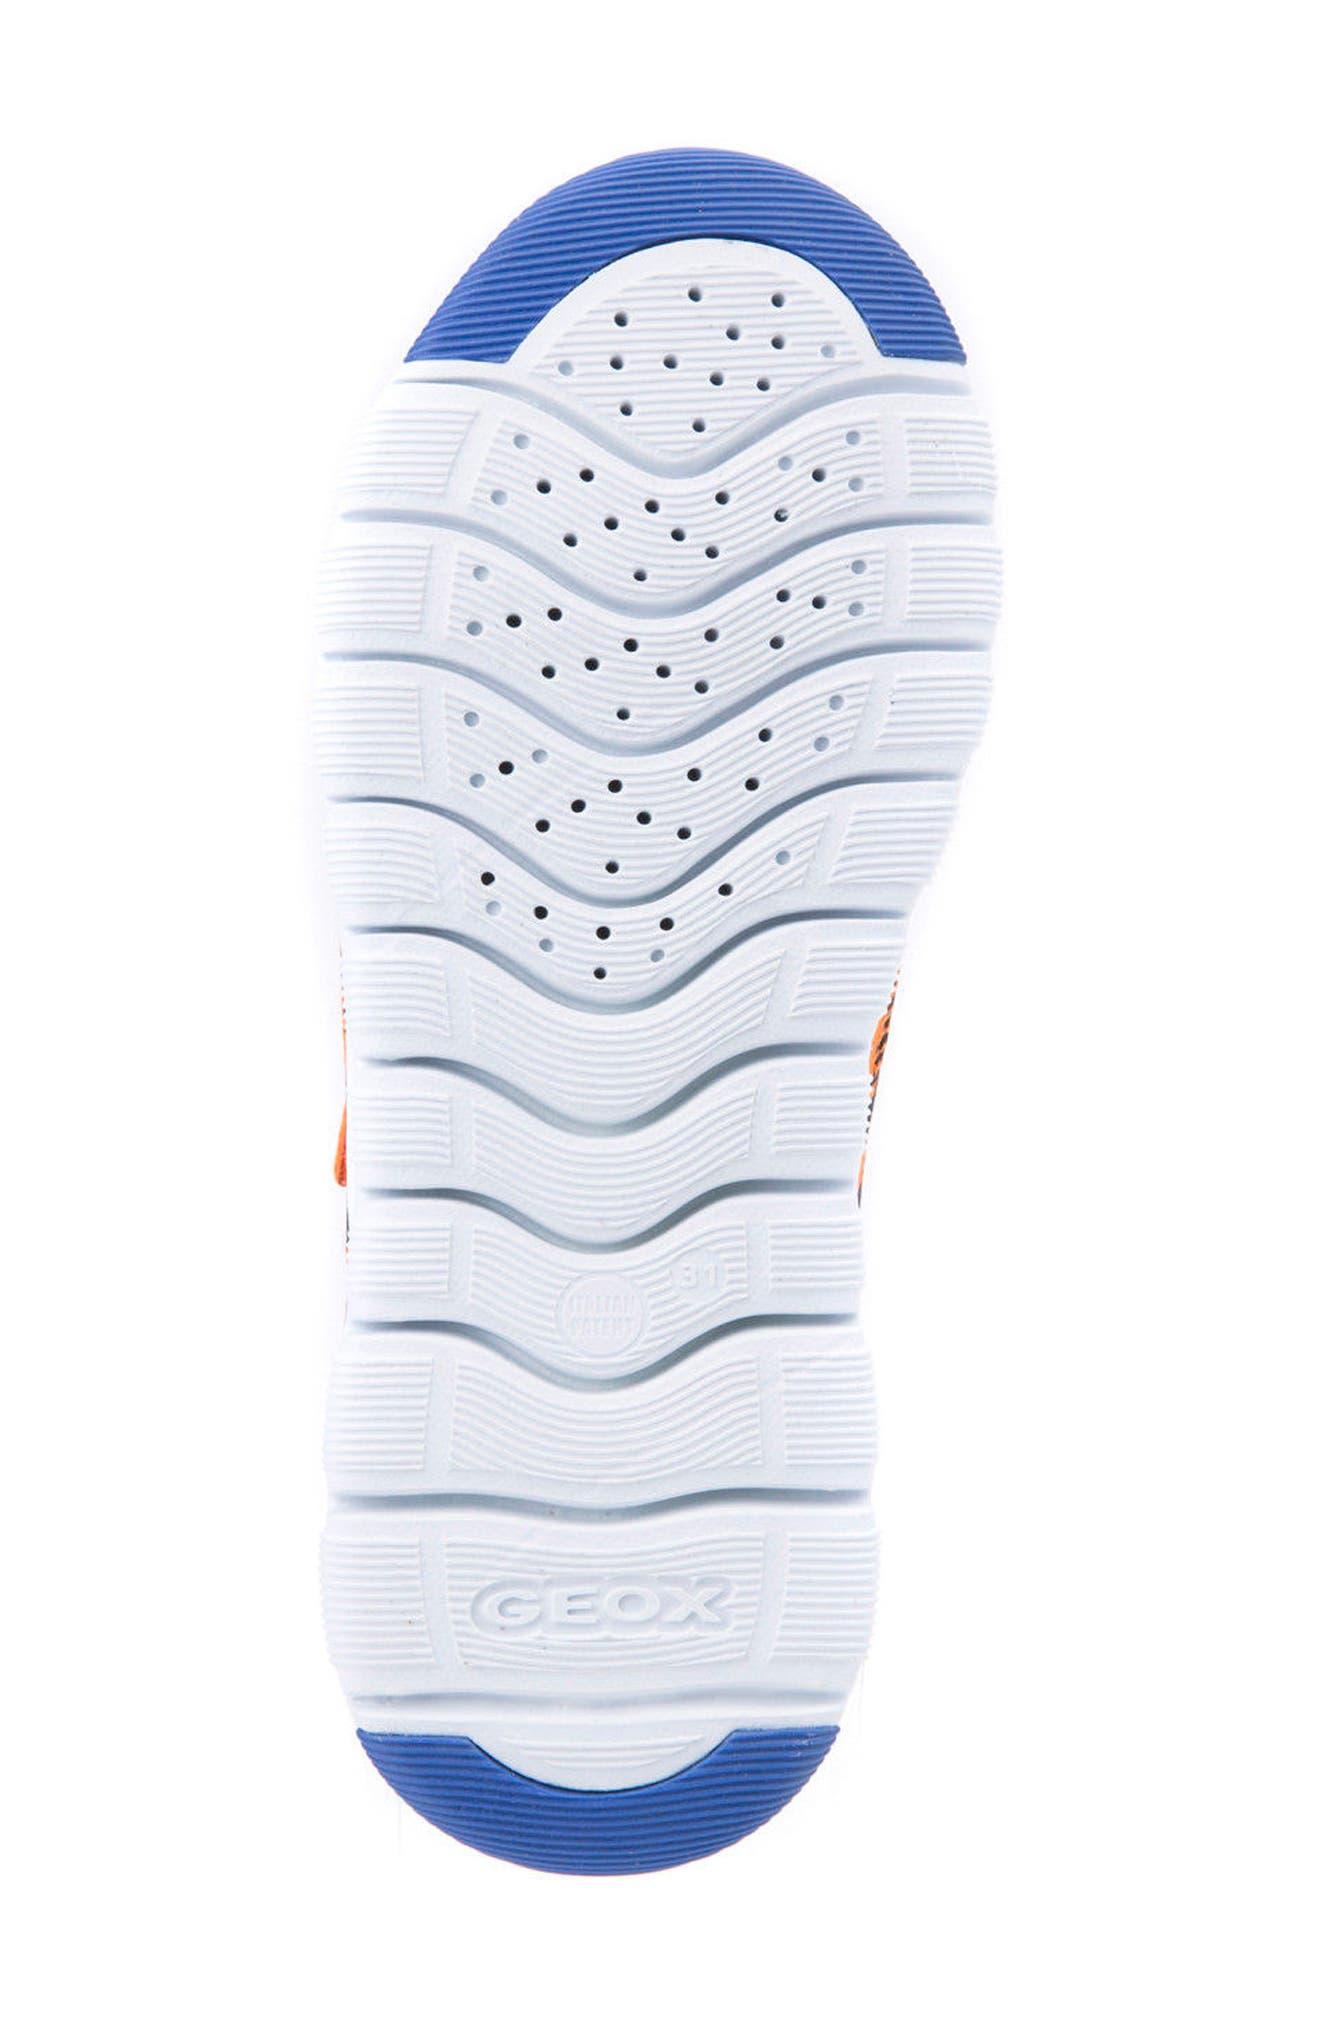 Xunday Low Top Woven Sneaker,                             Alternate thumbnail 6, color,                             Orange/ Royal